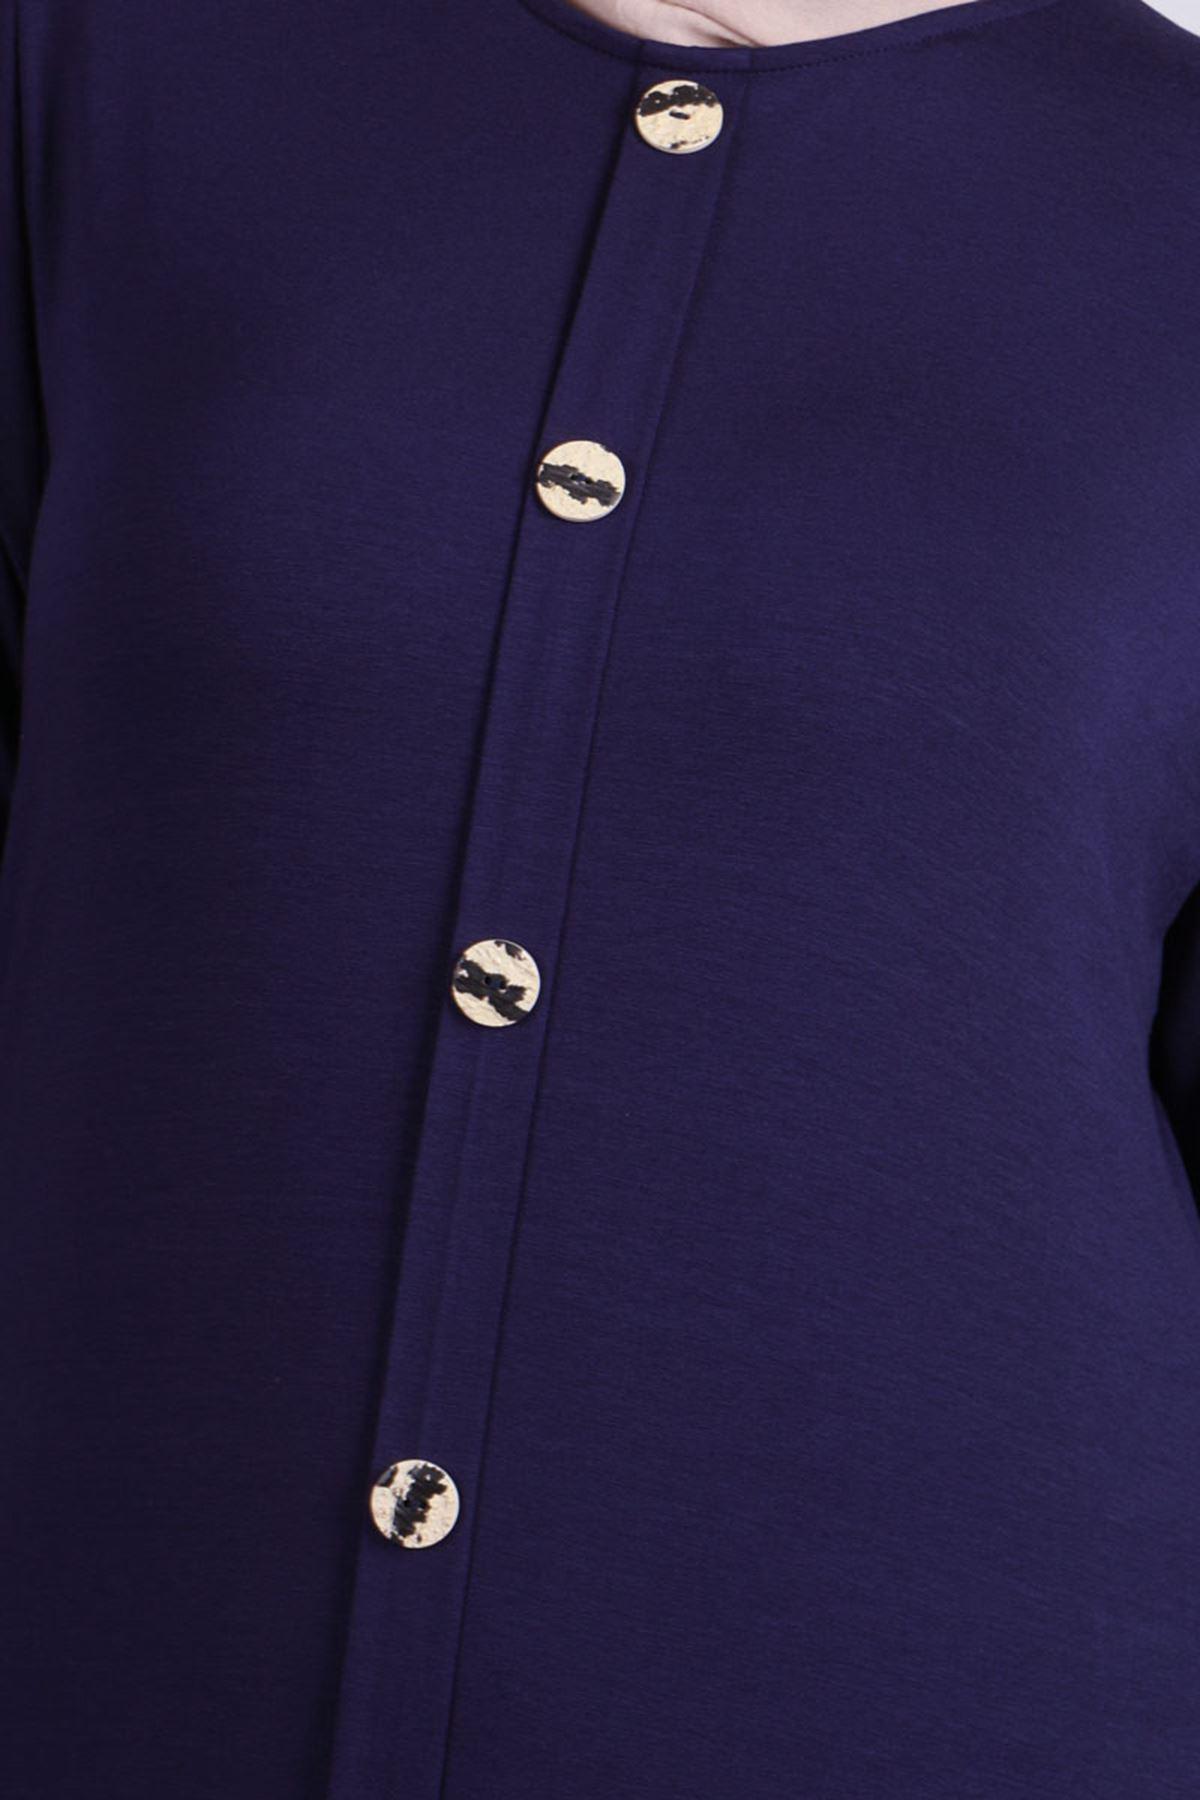 2090 Plus Size Front Buttoned Dress - Navy Blue